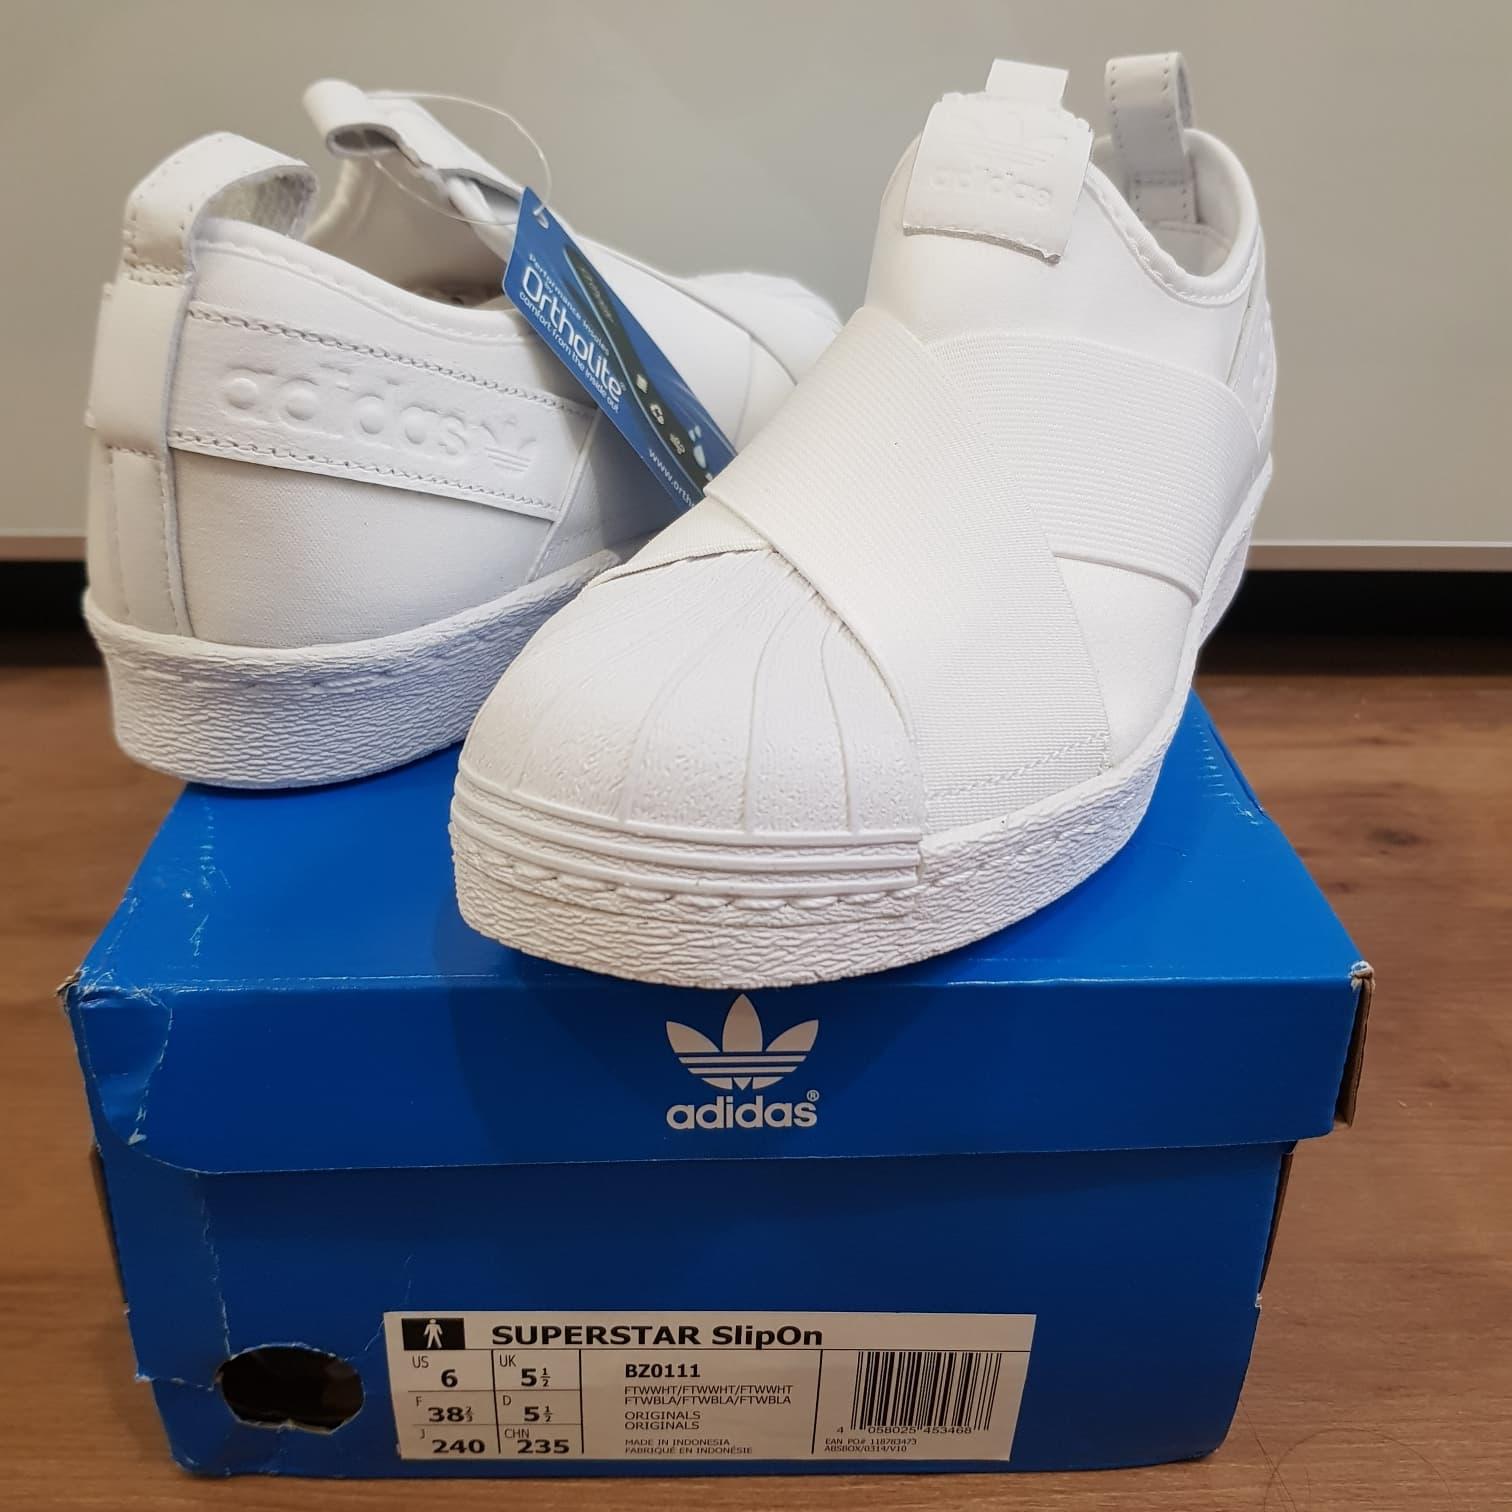 separation shoes 86374 2d547 Jual Adidas superstar slip on original size 38,5 - , - DKI ...